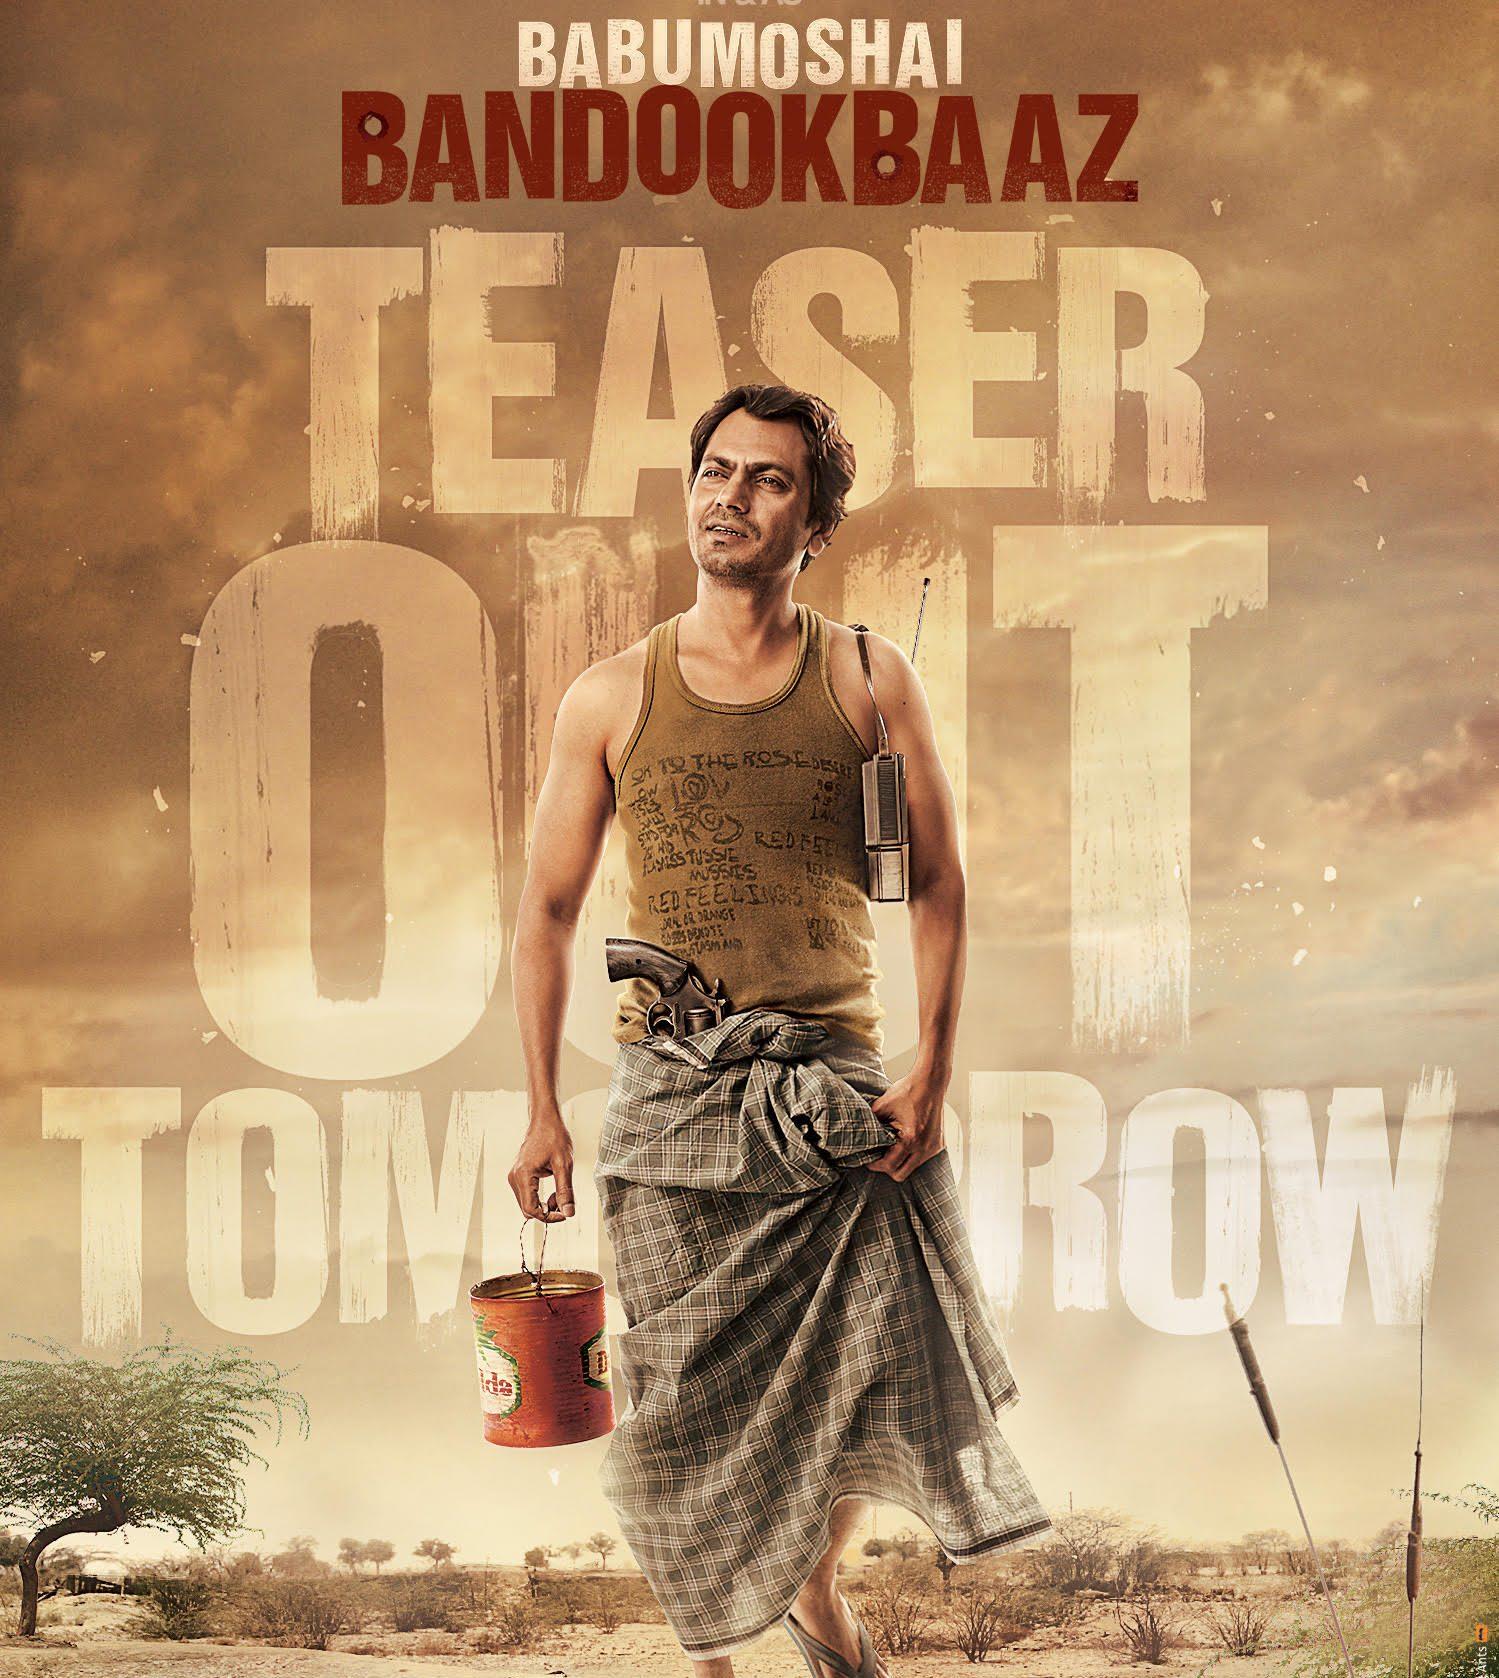 babumoshai-bandookbaaz-new-poster-teaser-out-tomorrow